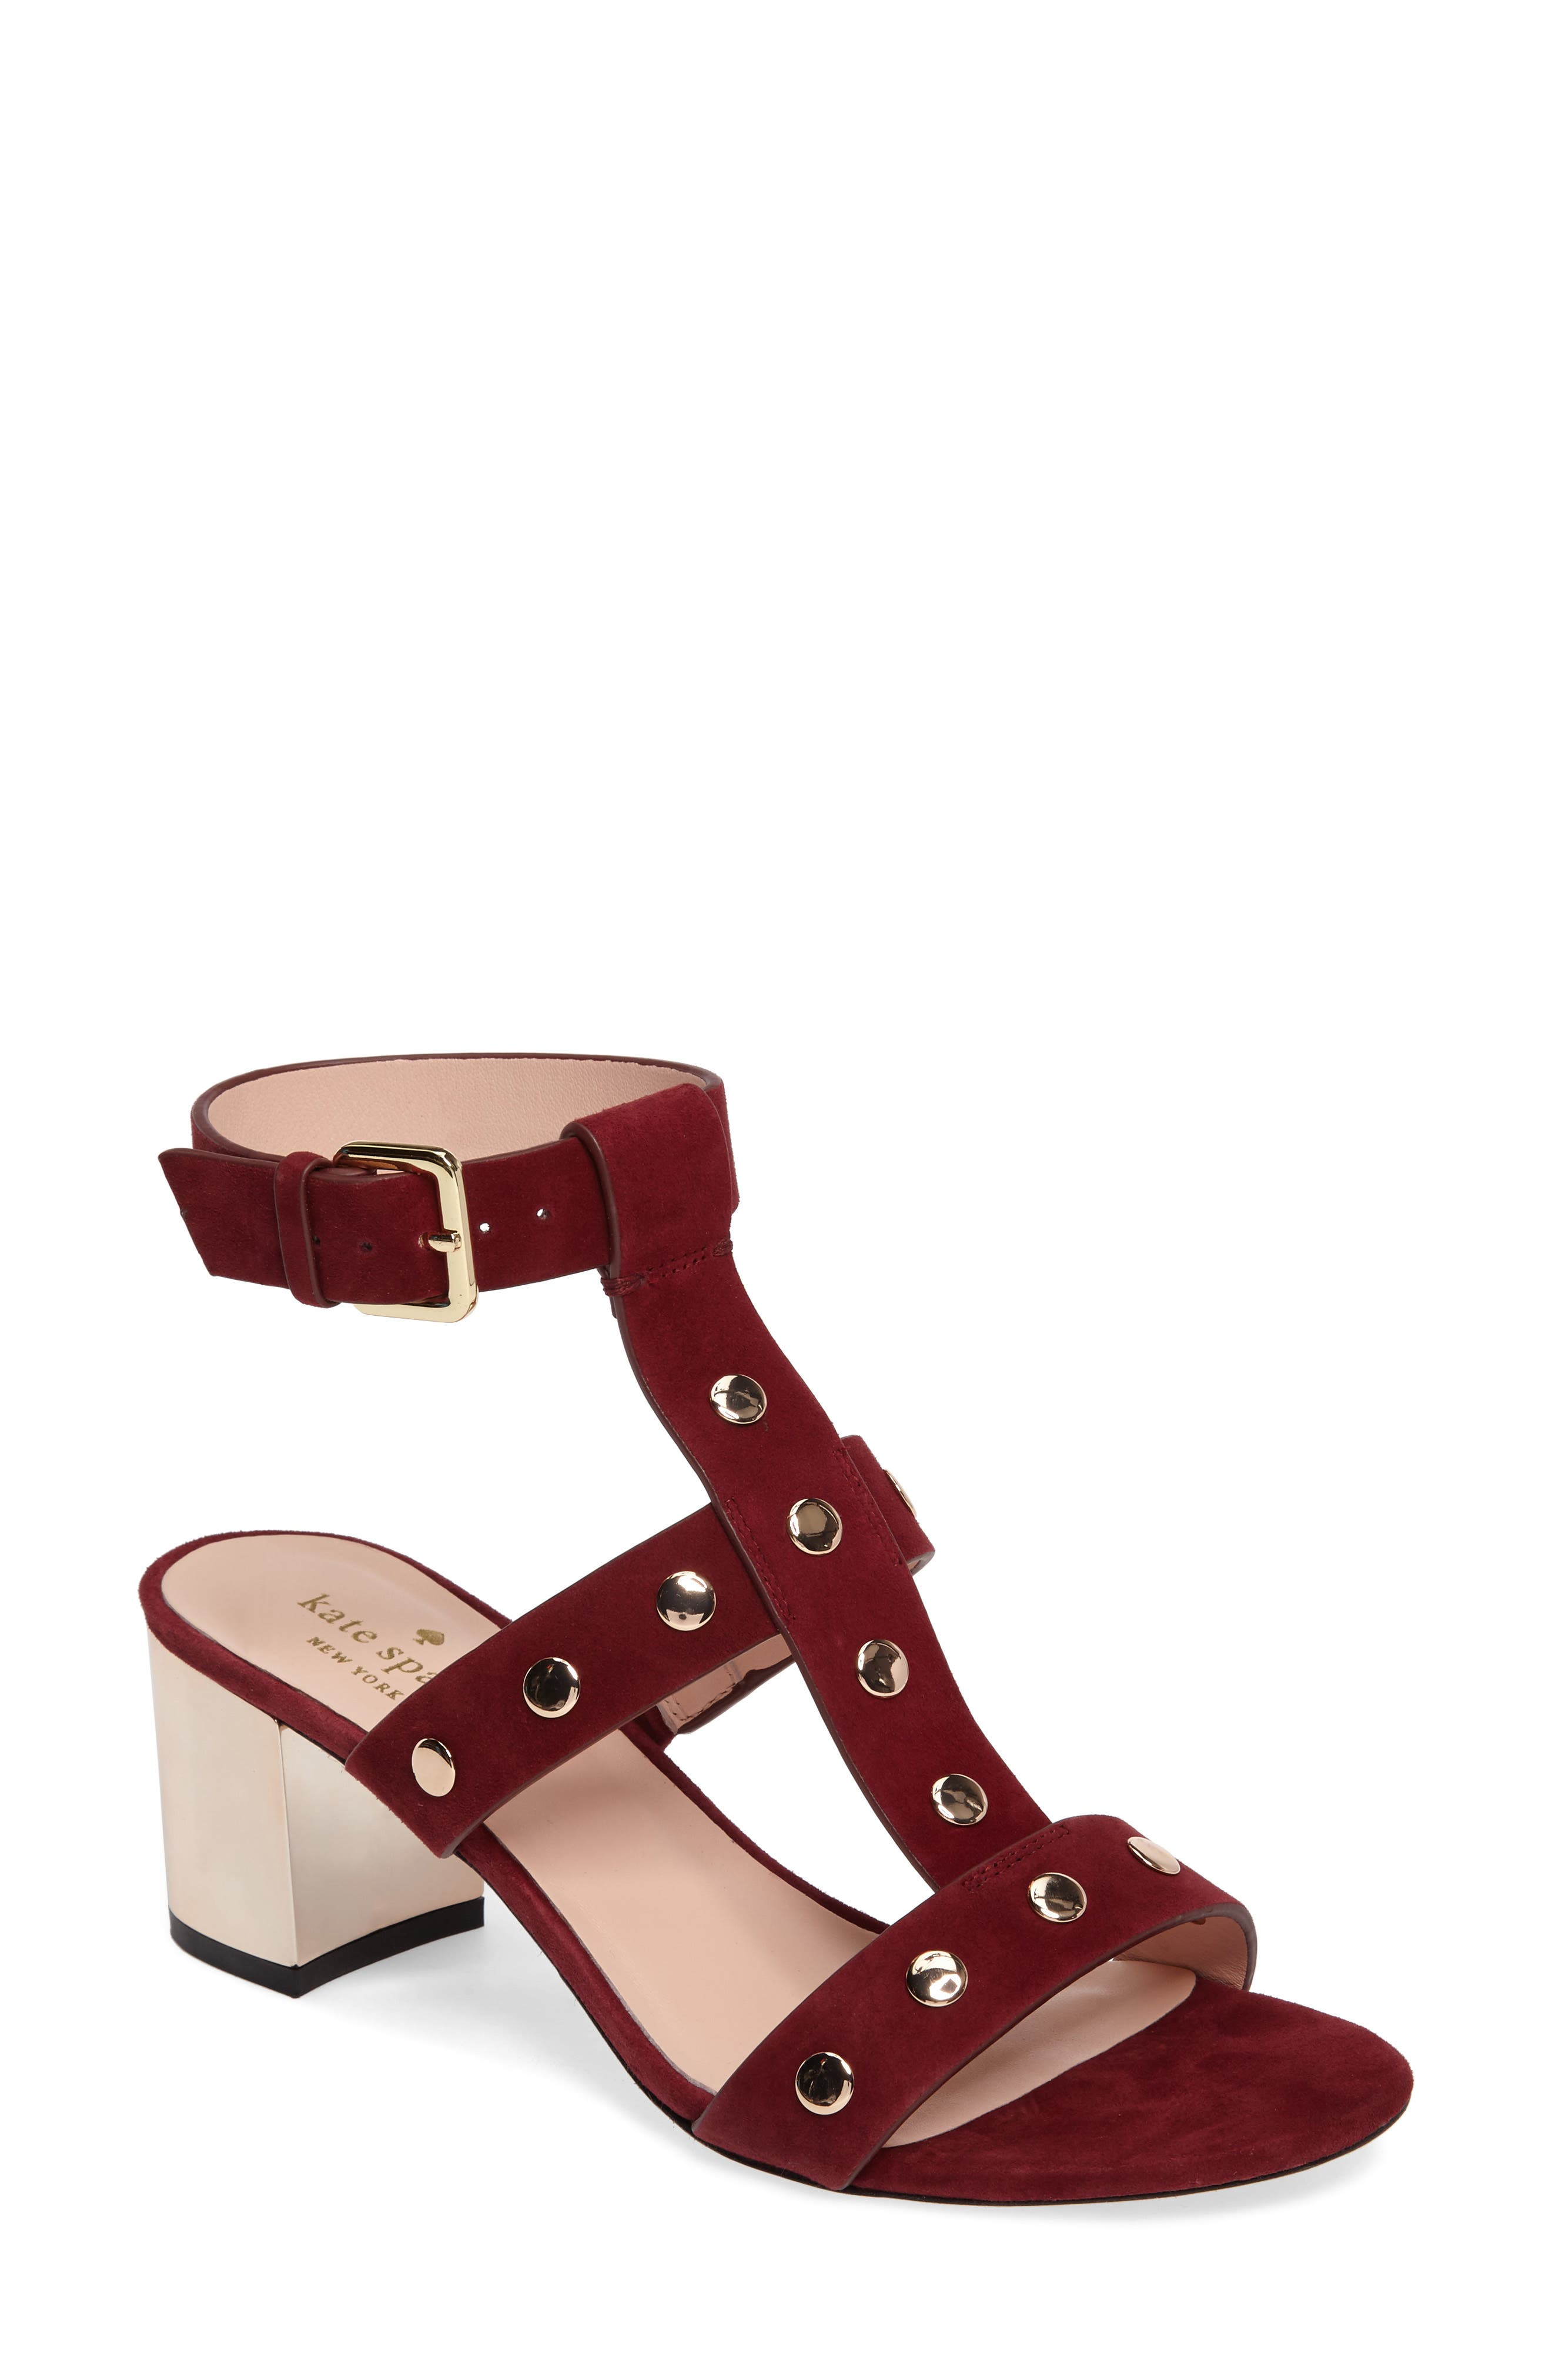 Alternate Image 1 Selected - kate spade new york welby t-strap sandal (Women)